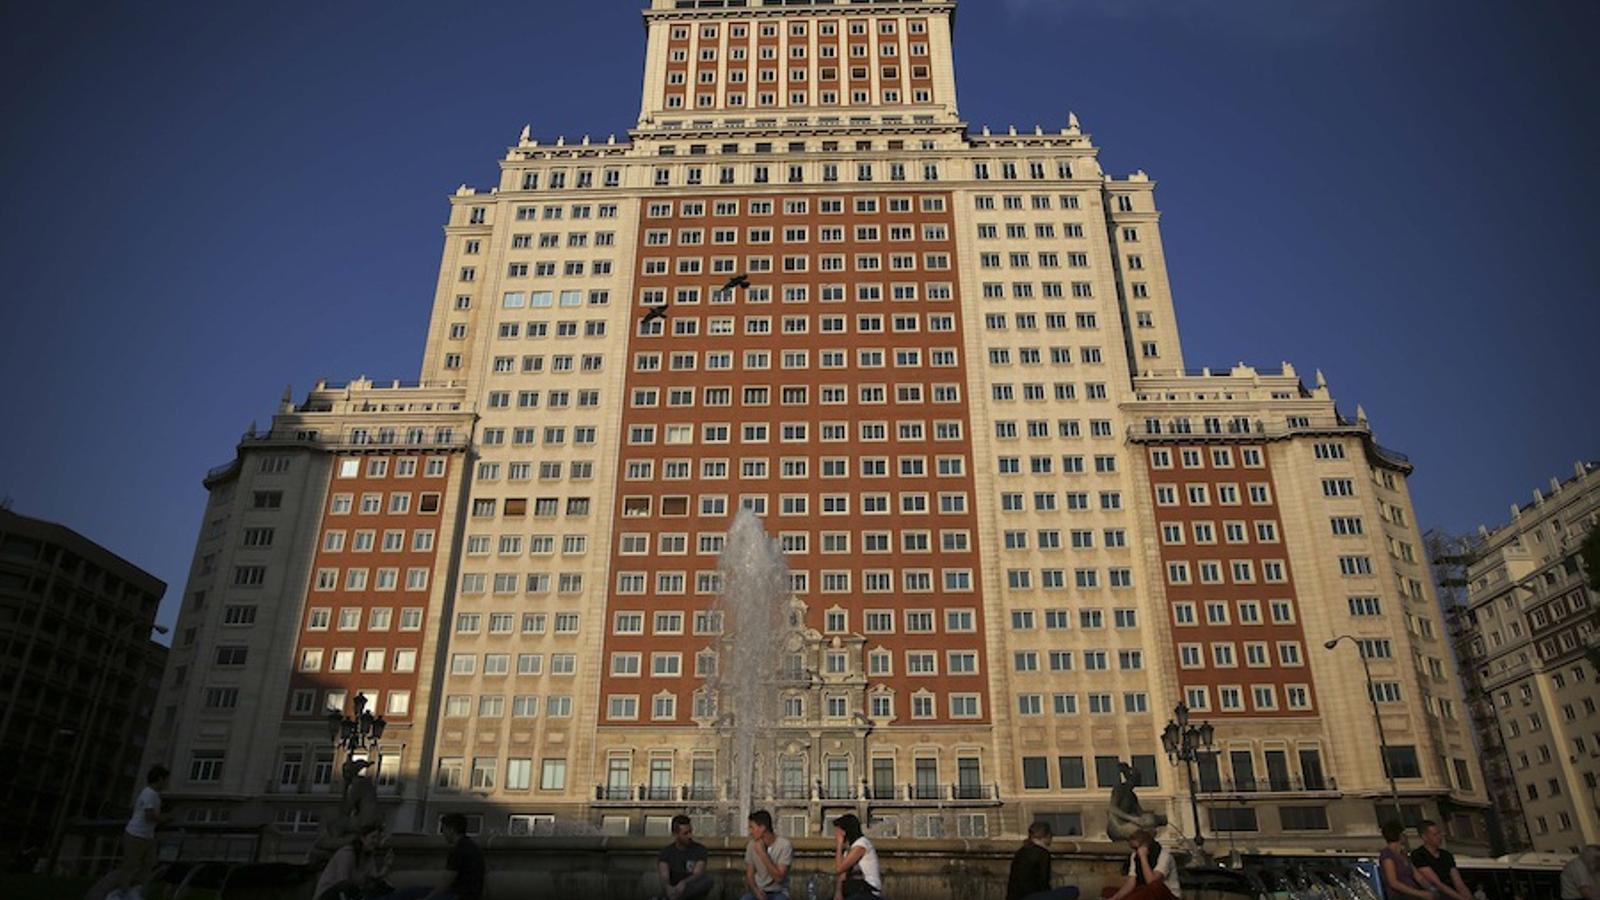 Una imatge de l'Edificio España a Madrid, que el Santander va comprar el 2005. EFE